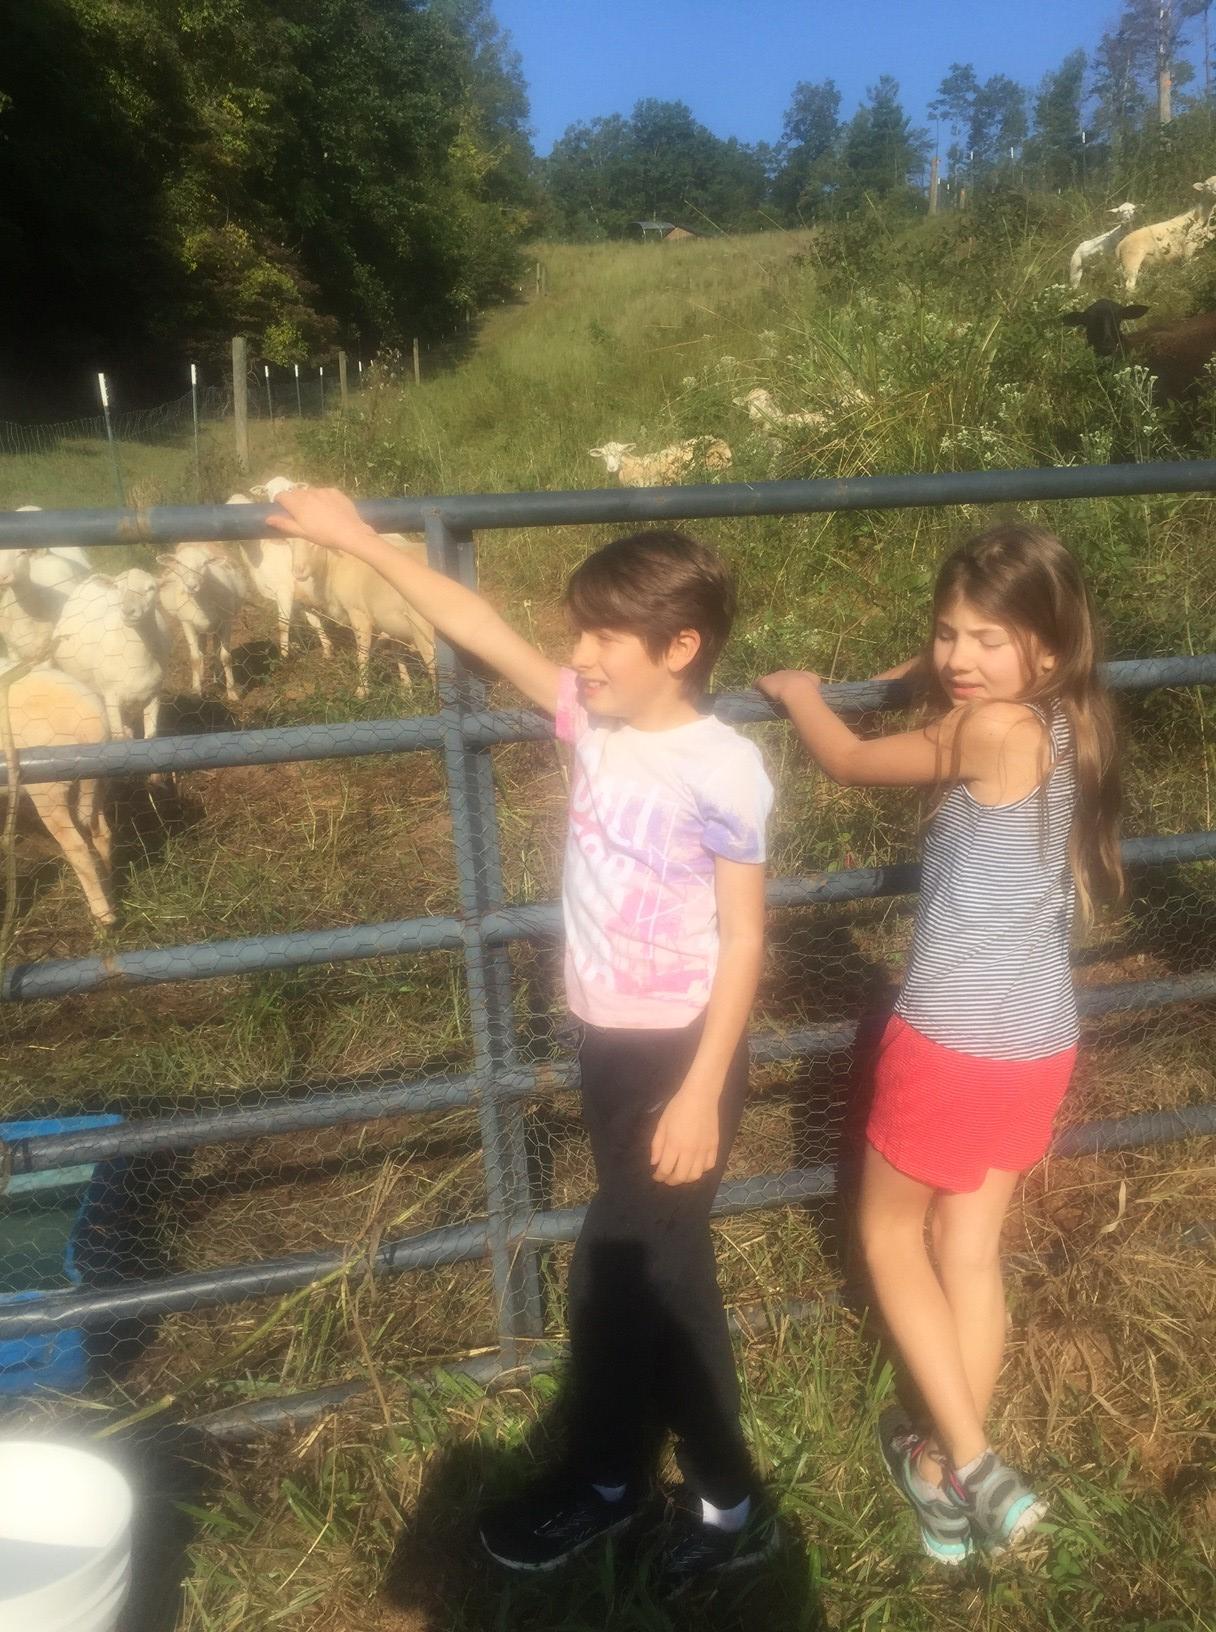 Frannys meeting the sheep